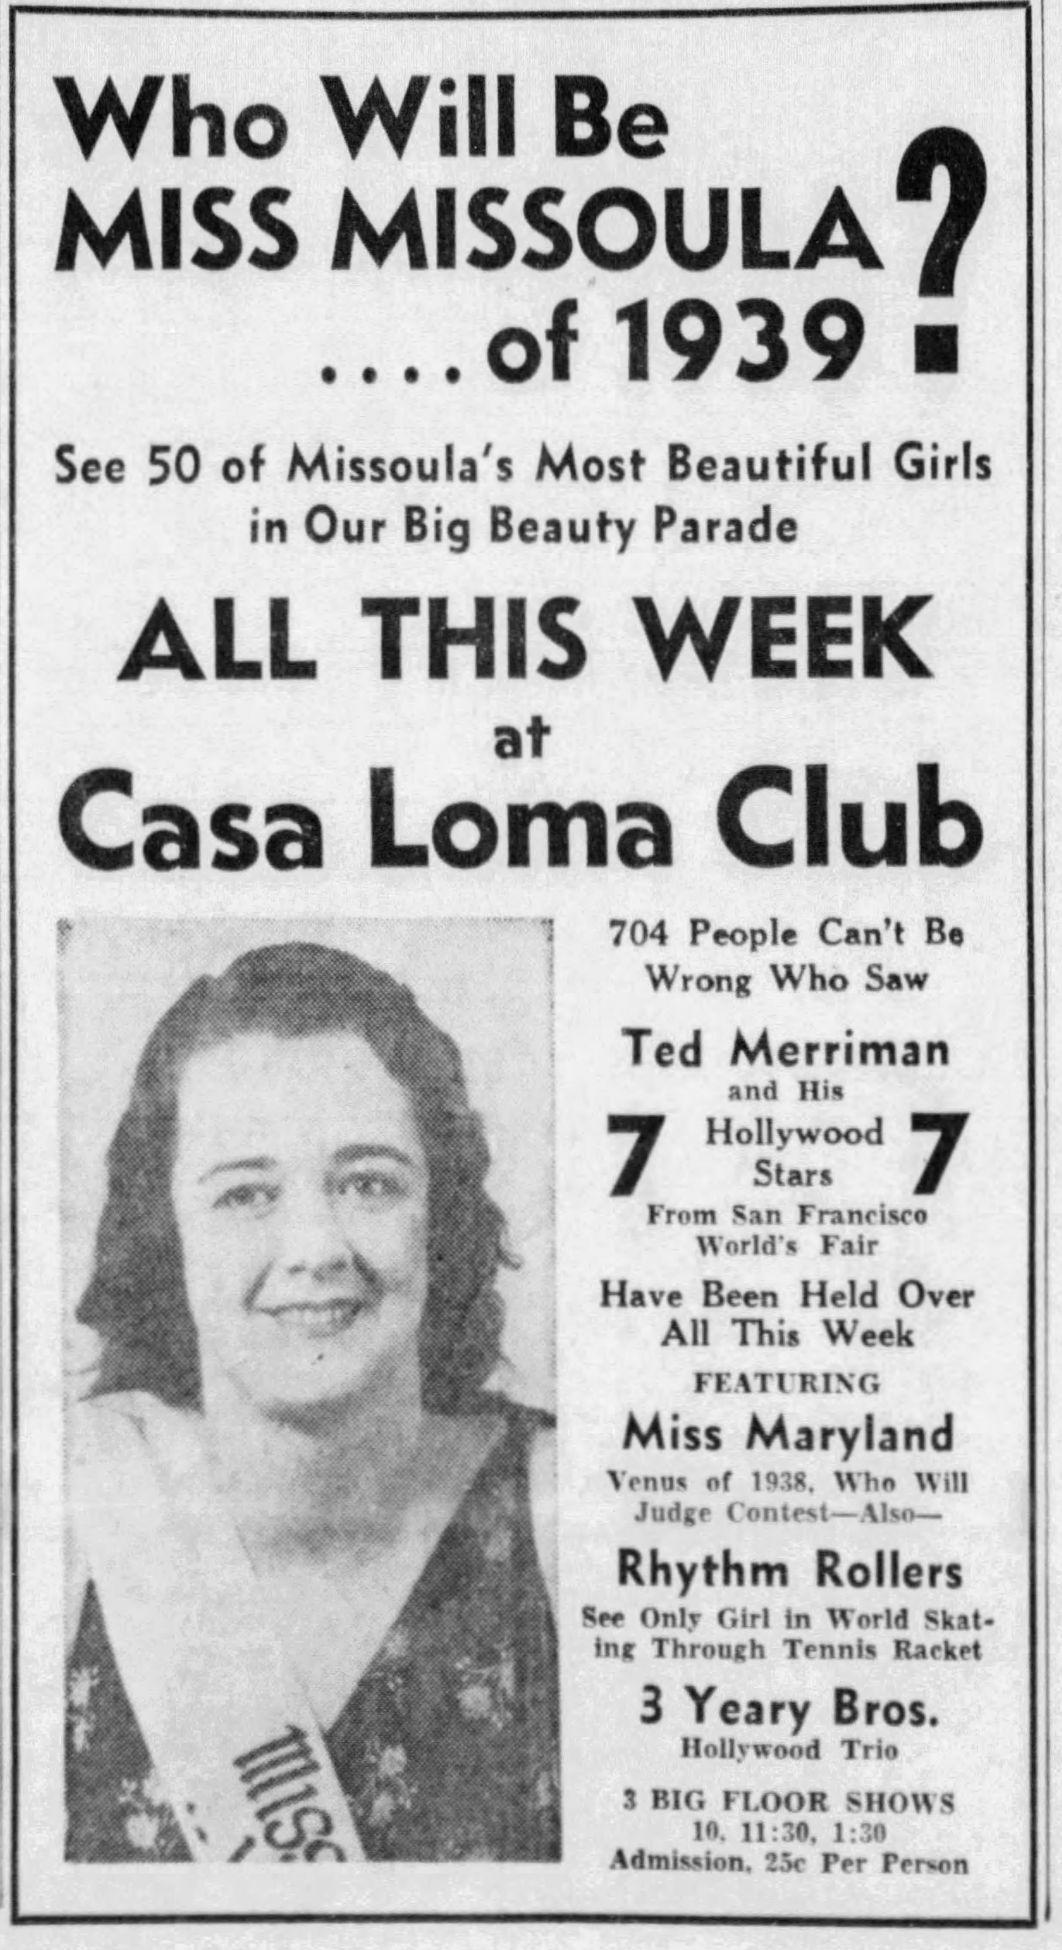 Casa Loma ad 1939 Miss Missoula